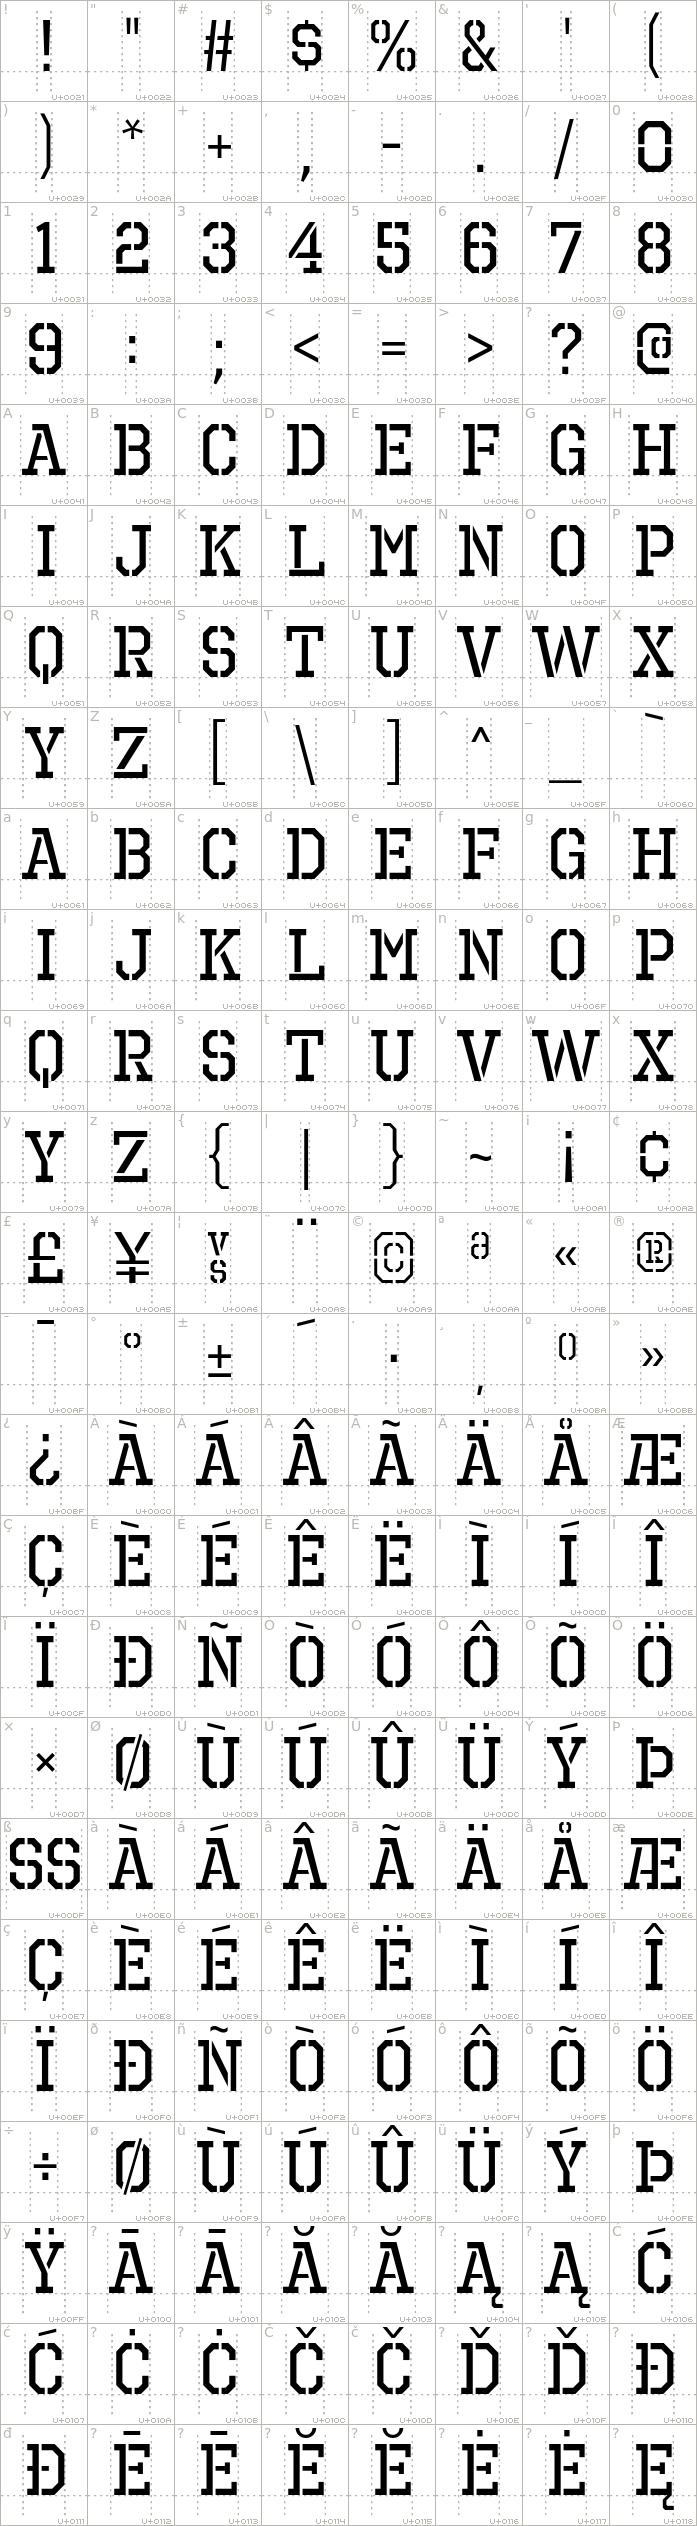 Octin Prison Font · 1001 Fonts   Stencil Fonts   Stencil